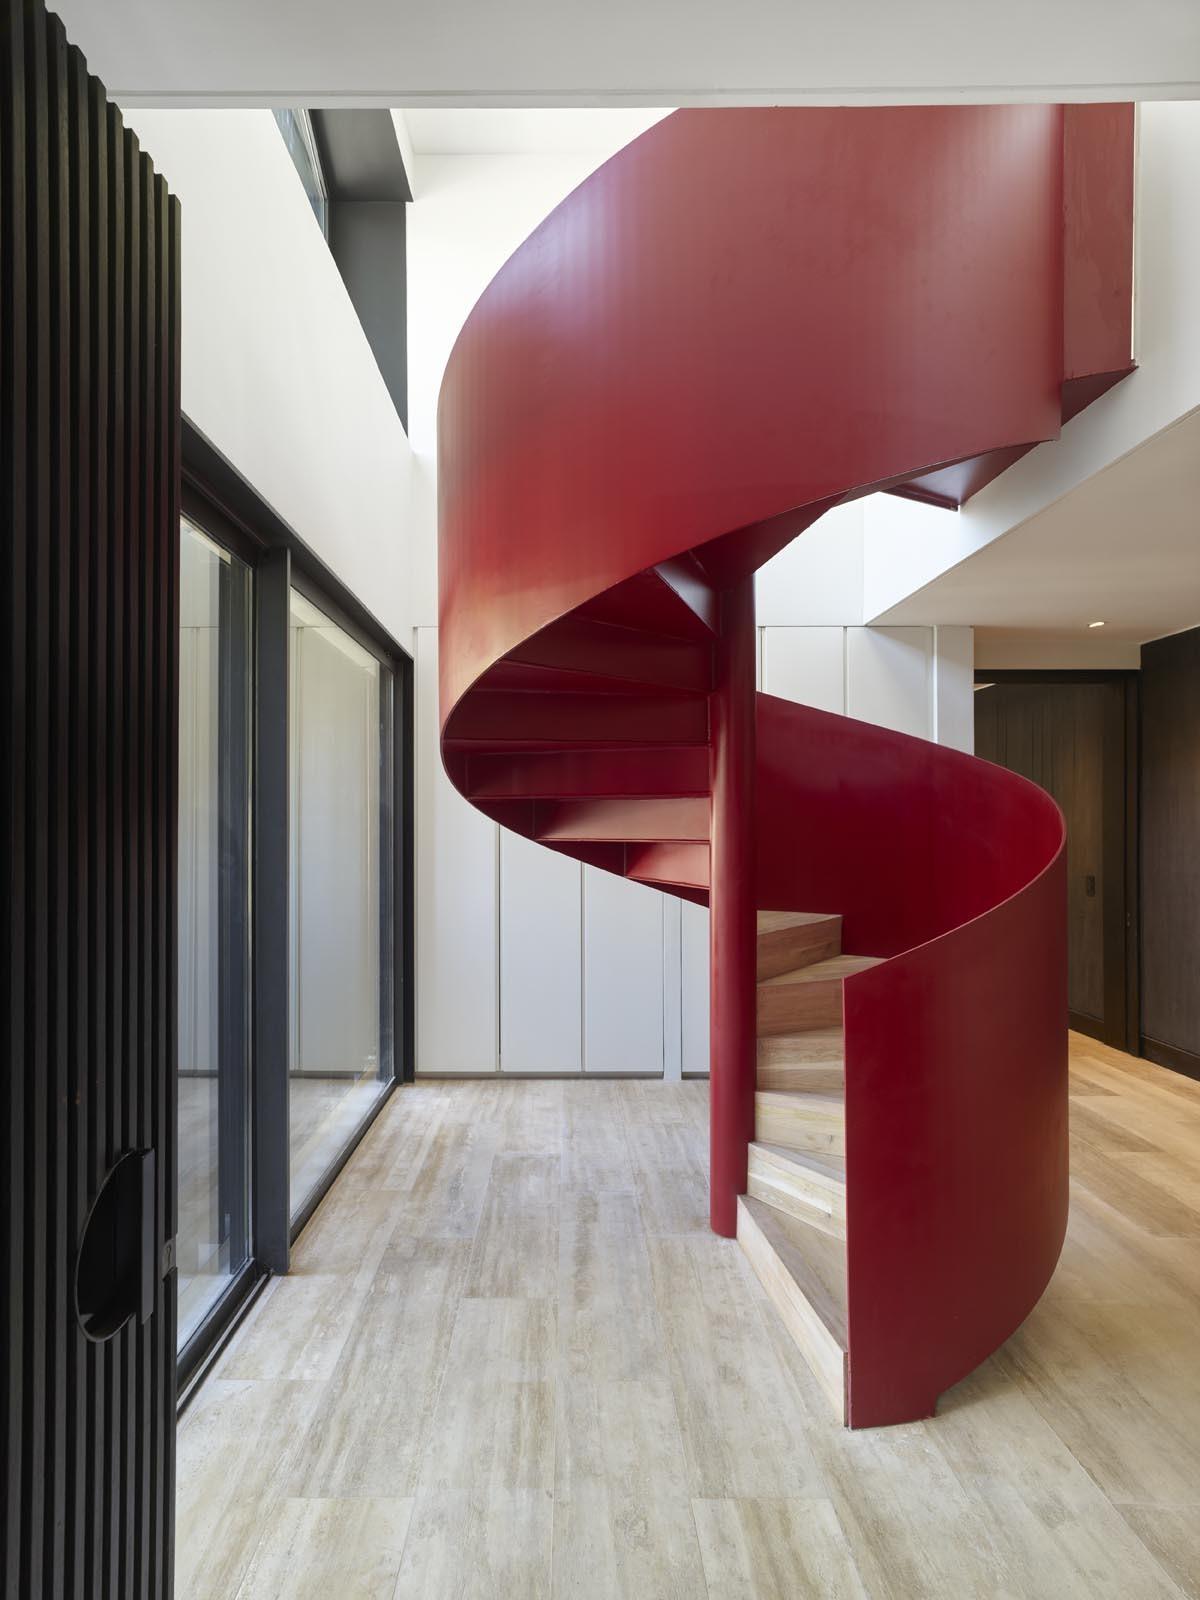 Galeria de resid ncia m laga prietoschaffer arquitectos 2 - Arquitectos interioristas malaga ...